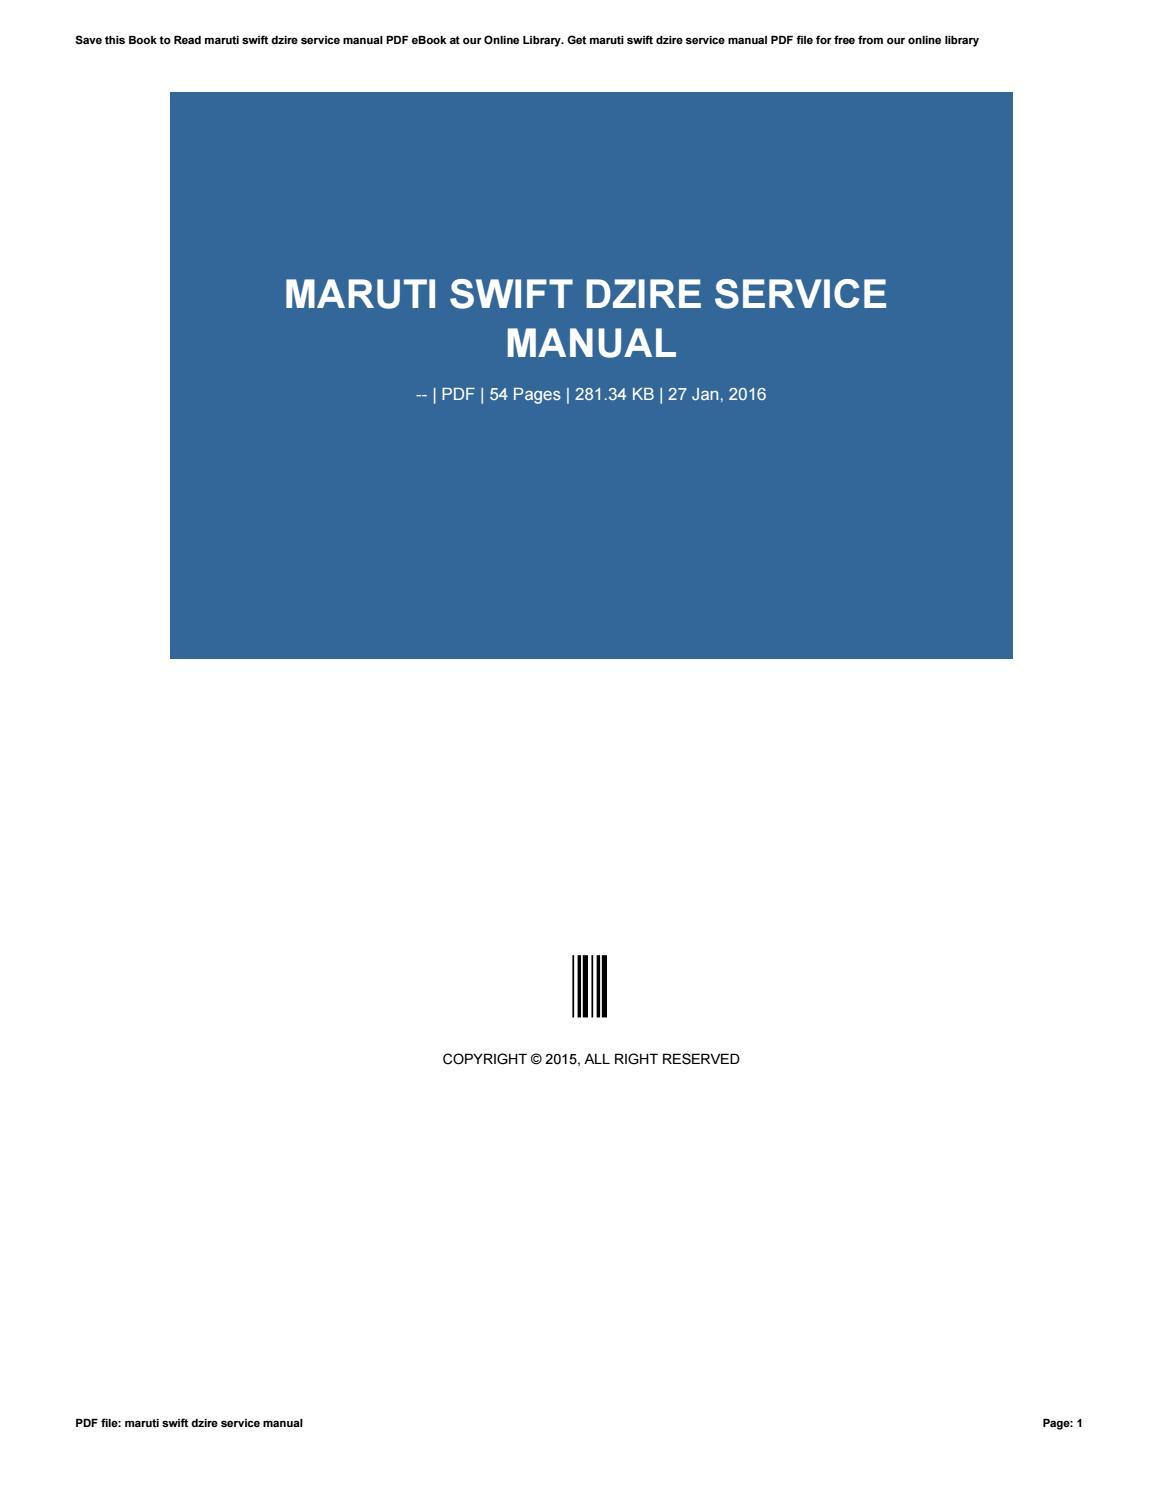 maruti swift dzire service manual by rblx9 issuu rh issuu com maruti swift dzire service manual pdf maruti suzuki swift service manual pdf